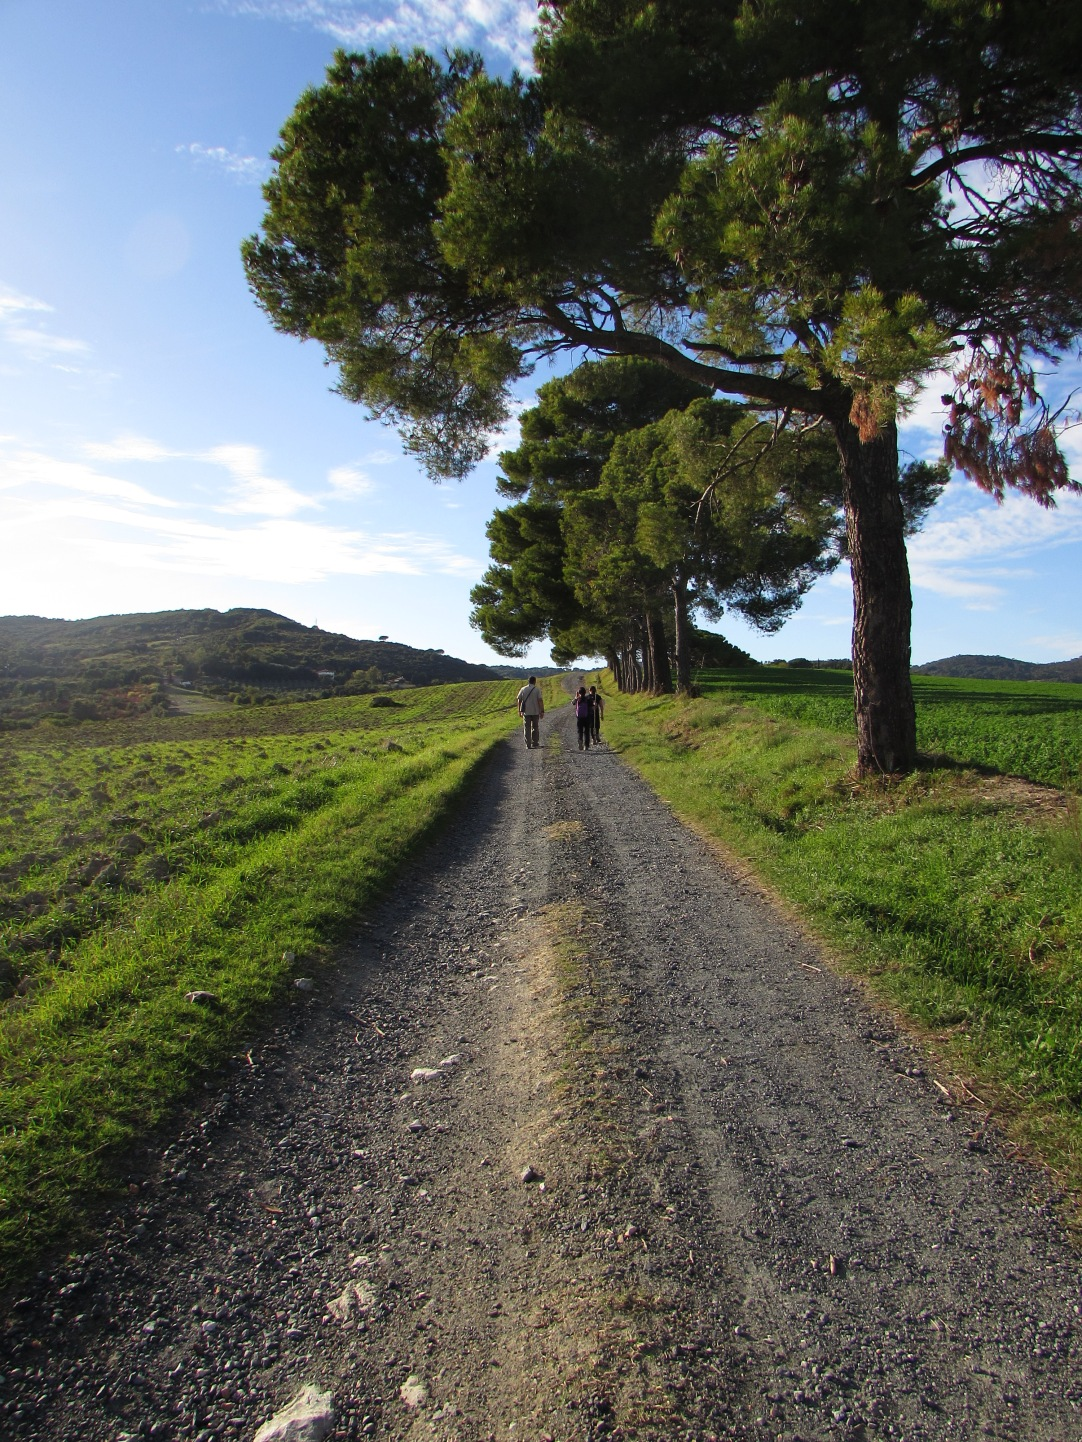 Passeggiata tra Colline Toscane